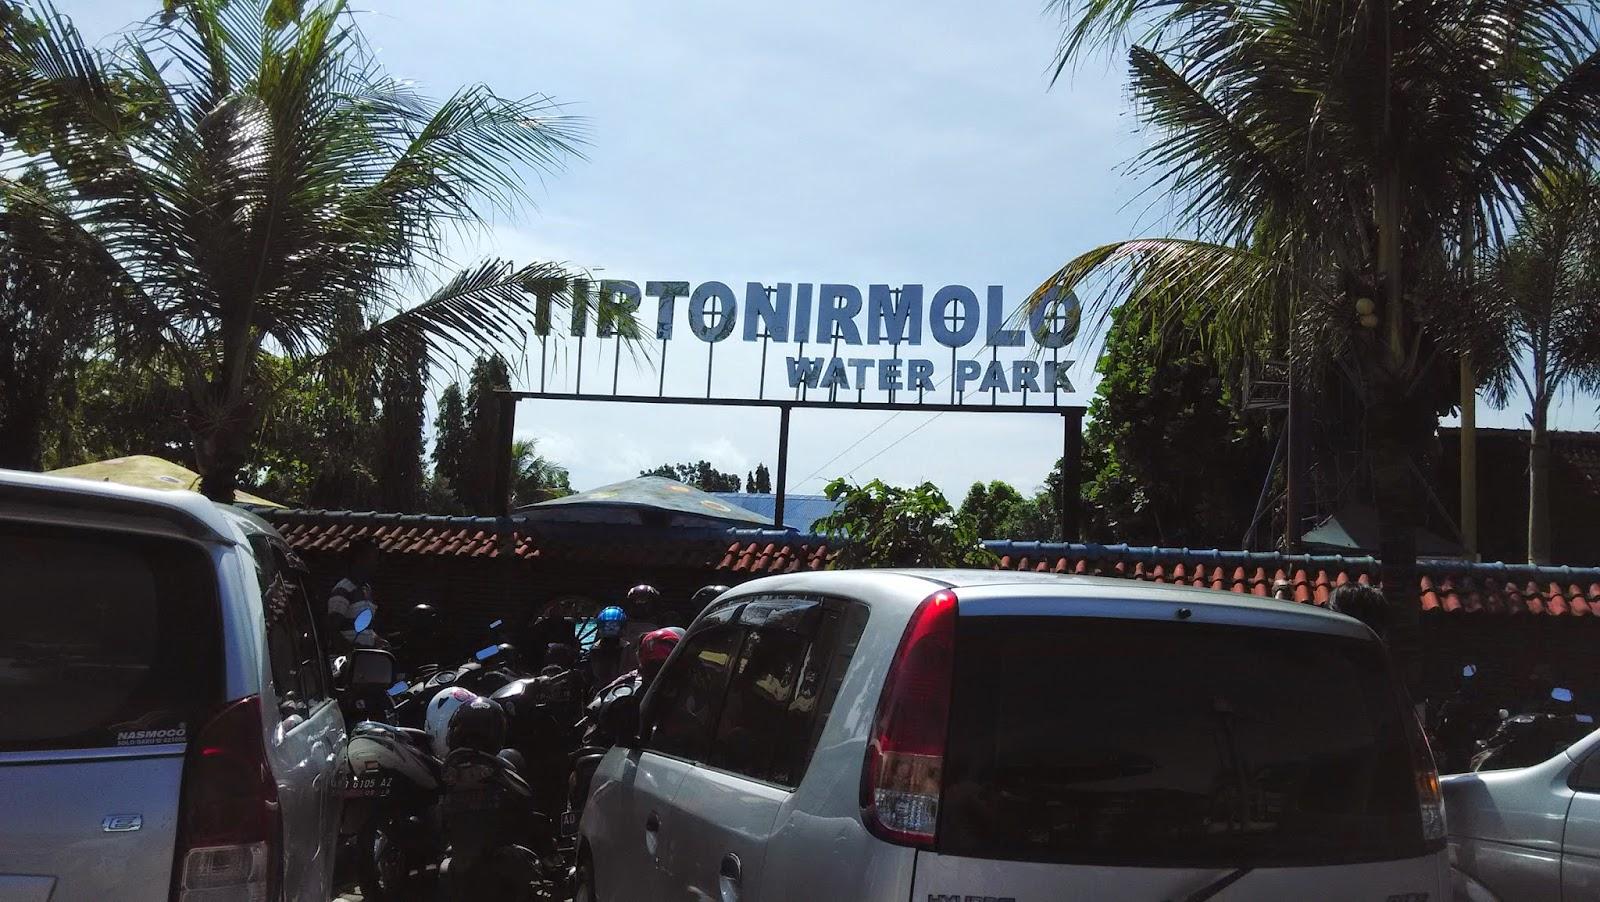 Waterpark Galuh Tirtonirmolo Taman Air Kab Ngawi